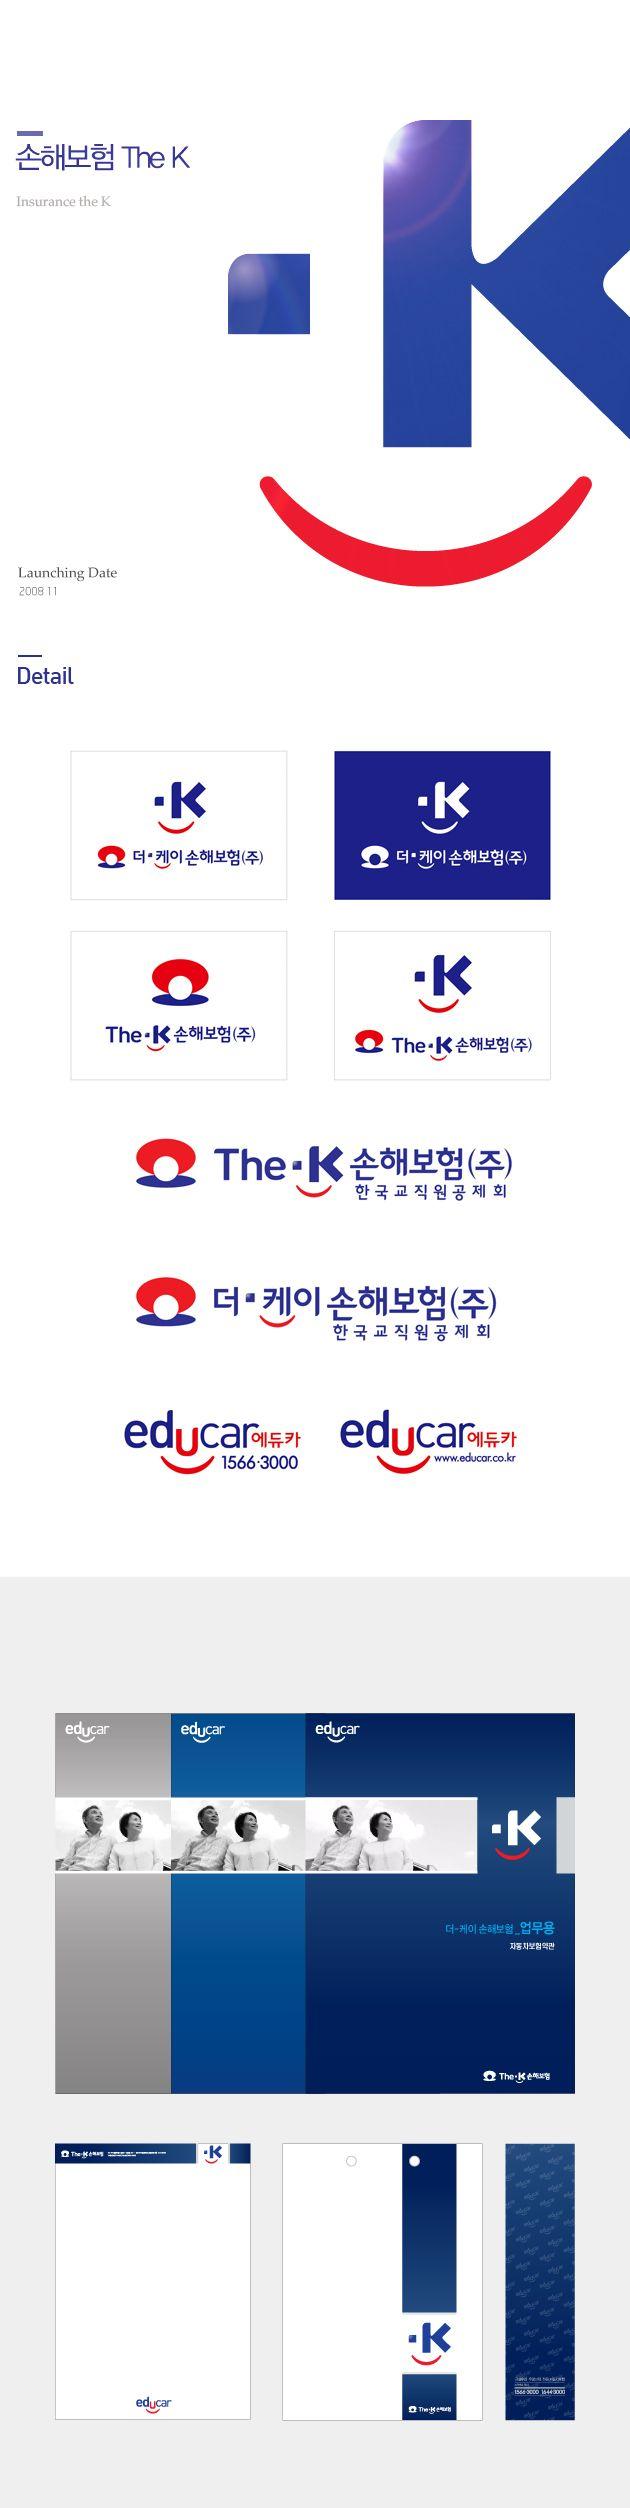 Insurance the K #edacom